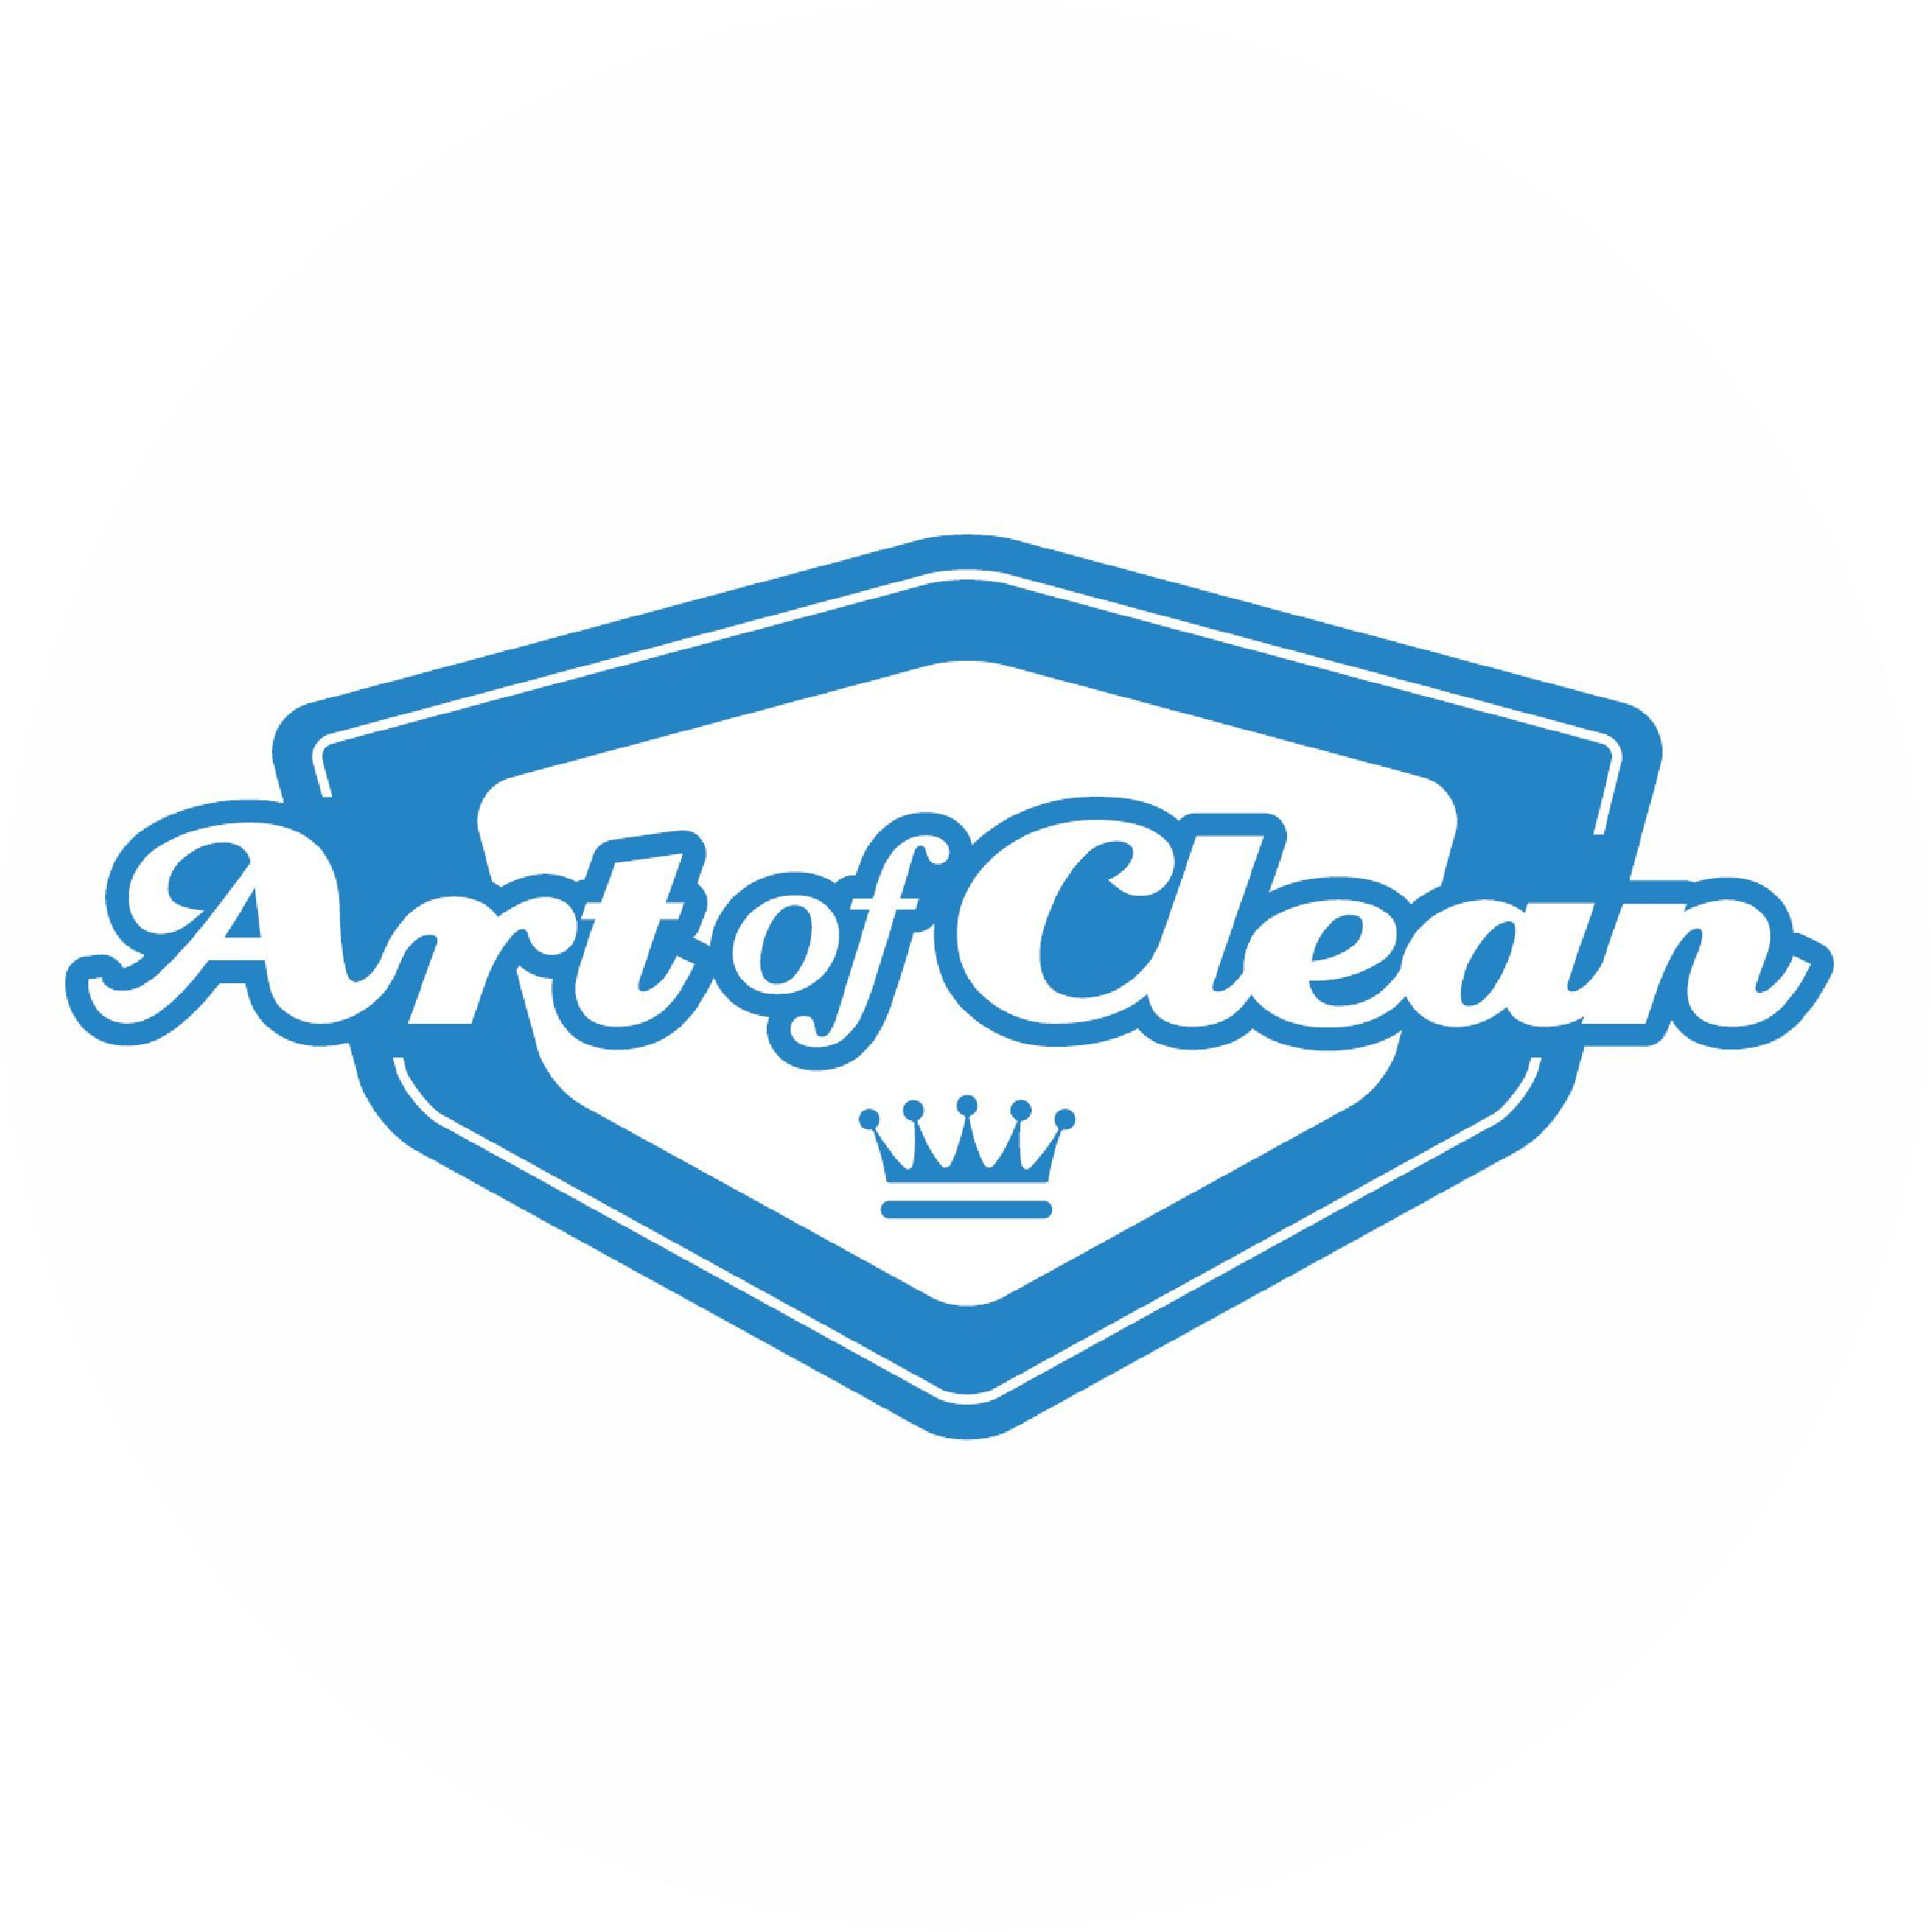 Pierre De Wett- Art of Clean